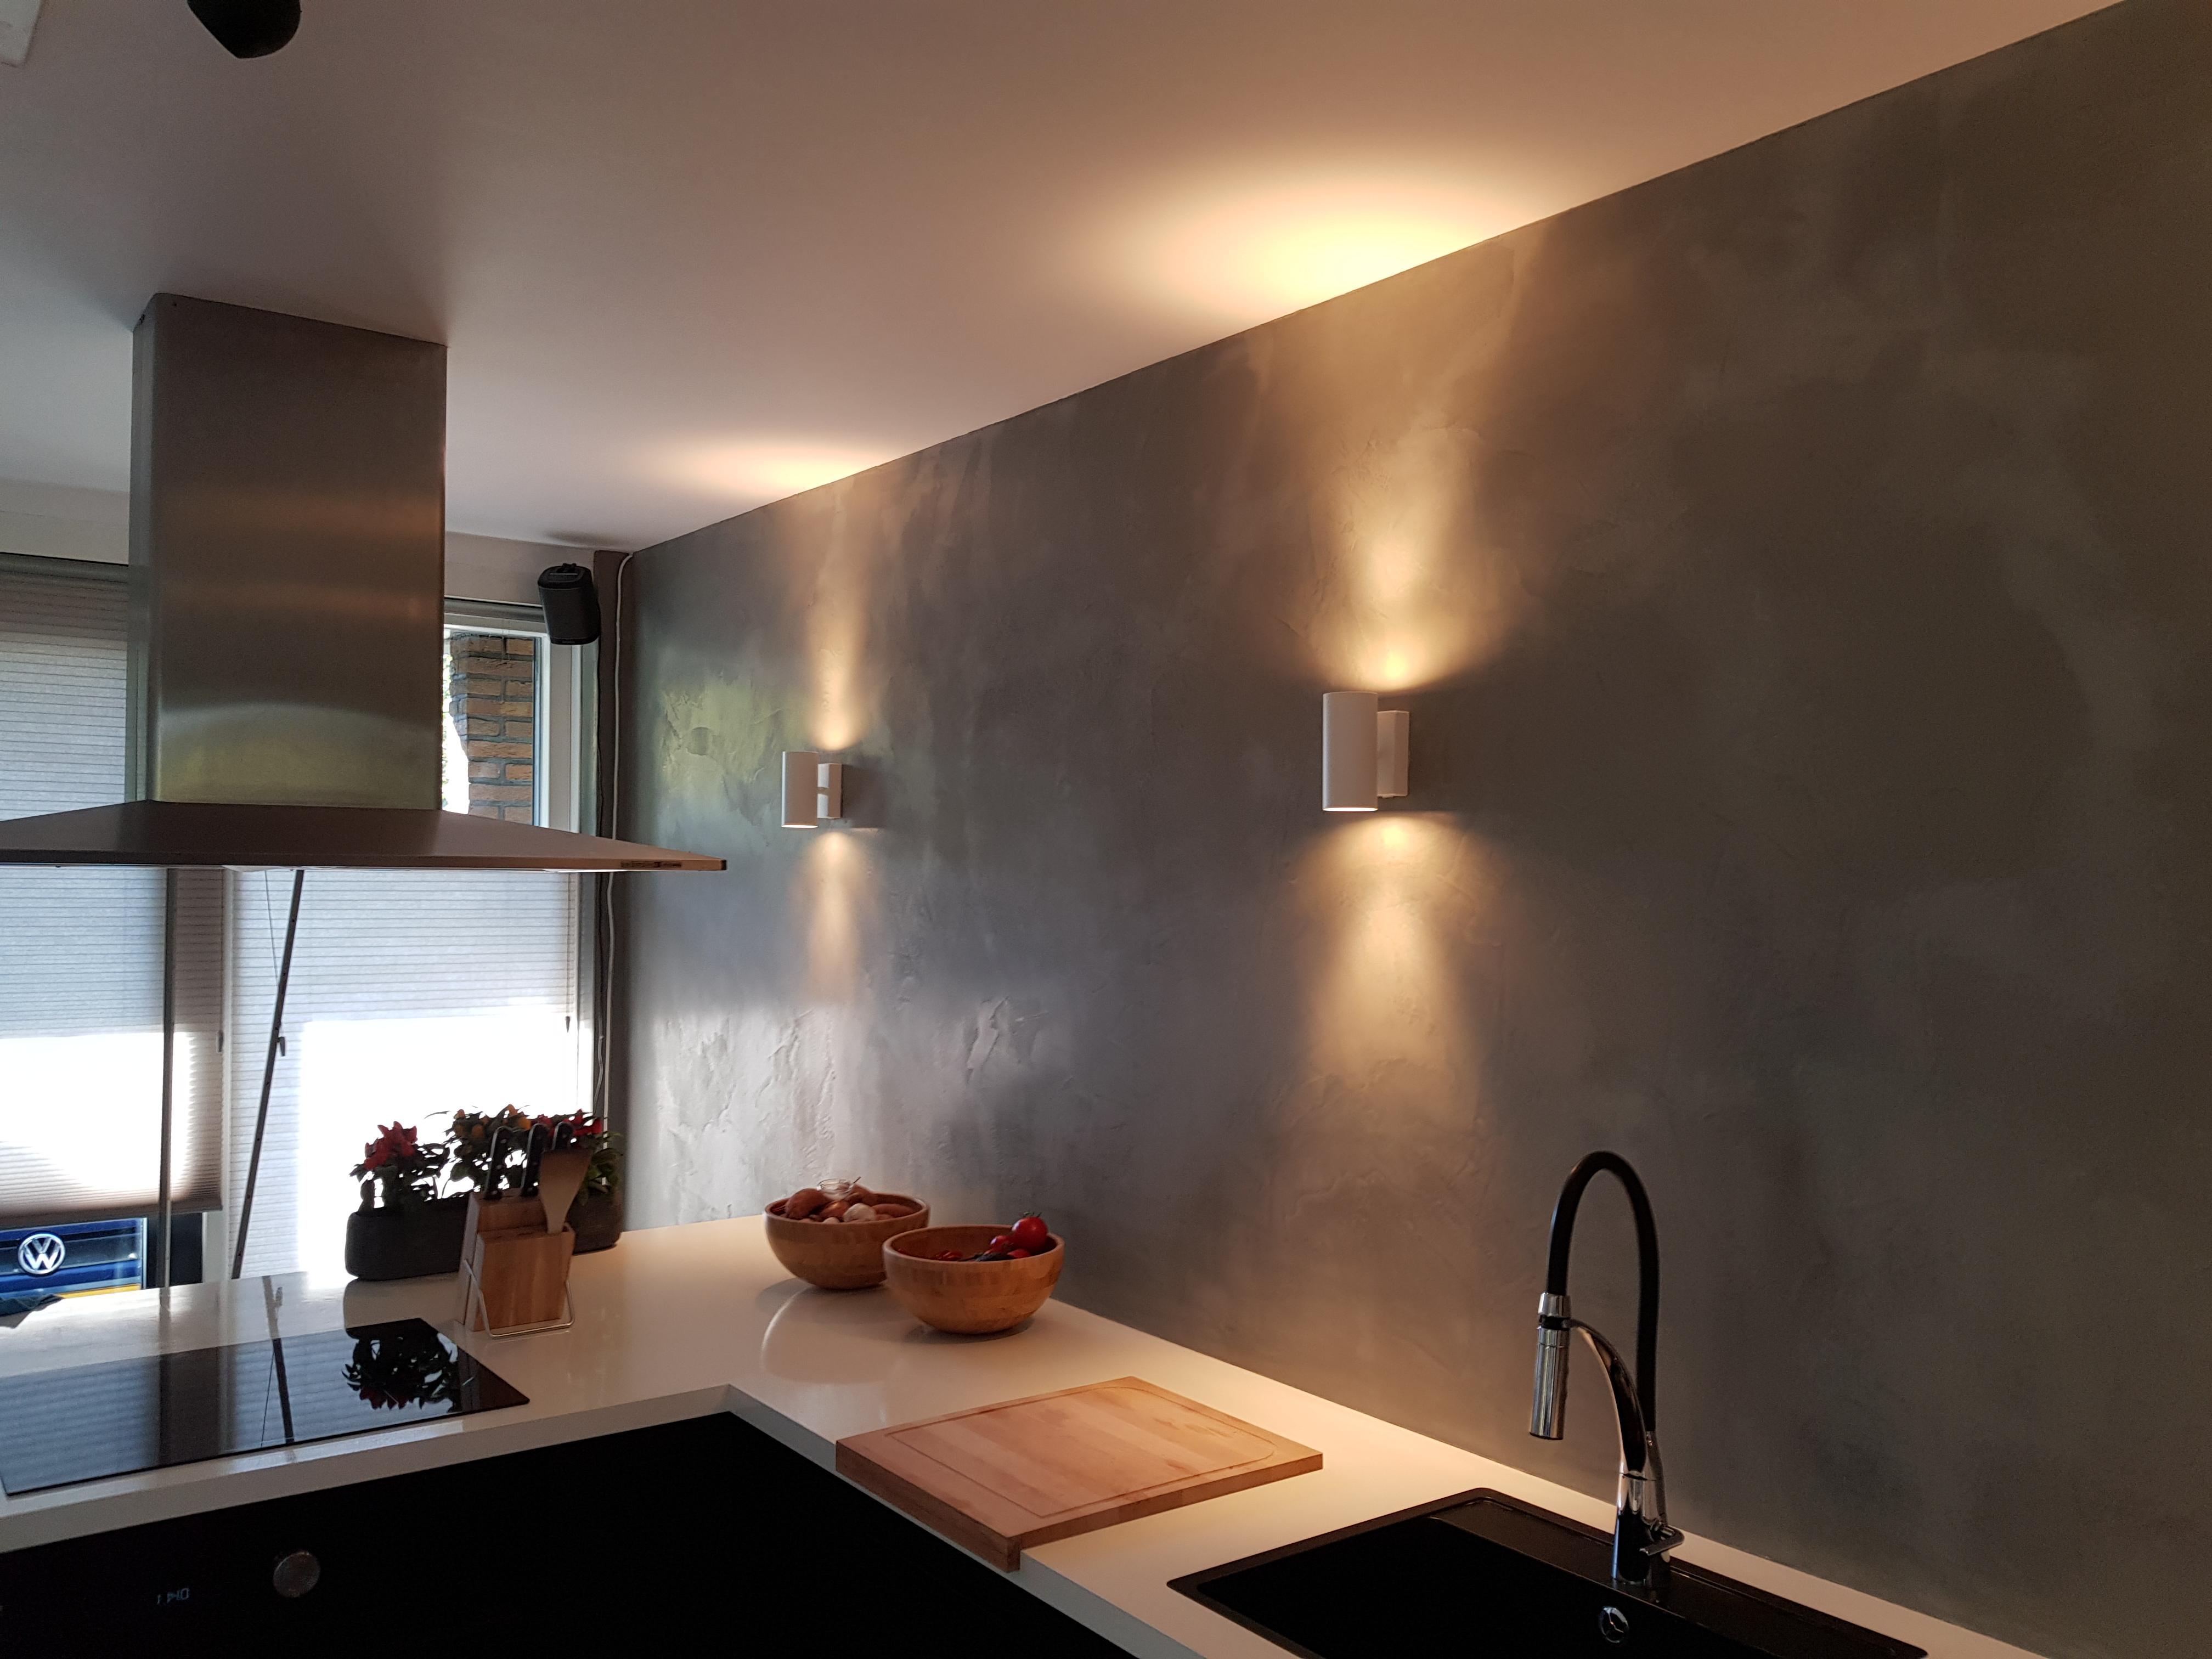 Marmorino in keuken 2